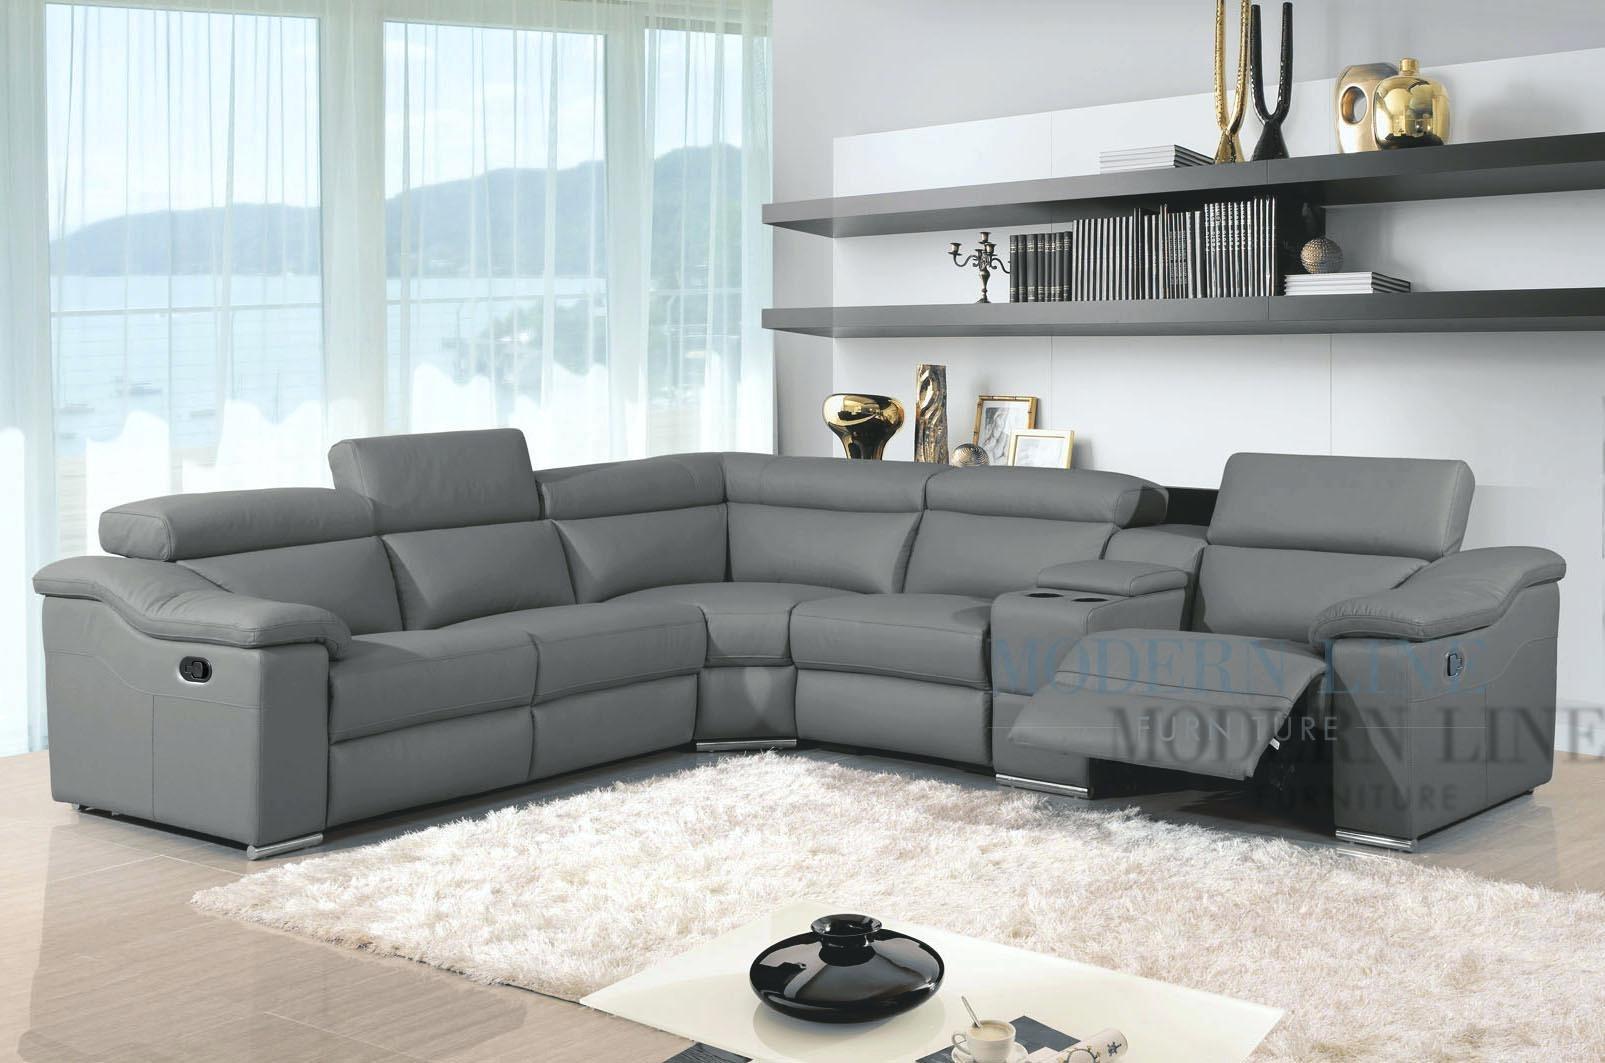 Leather Reclining Sectional Sofa – Kaaiz Inside Leather Recliner Sectional Sofas (View 4 of 10)